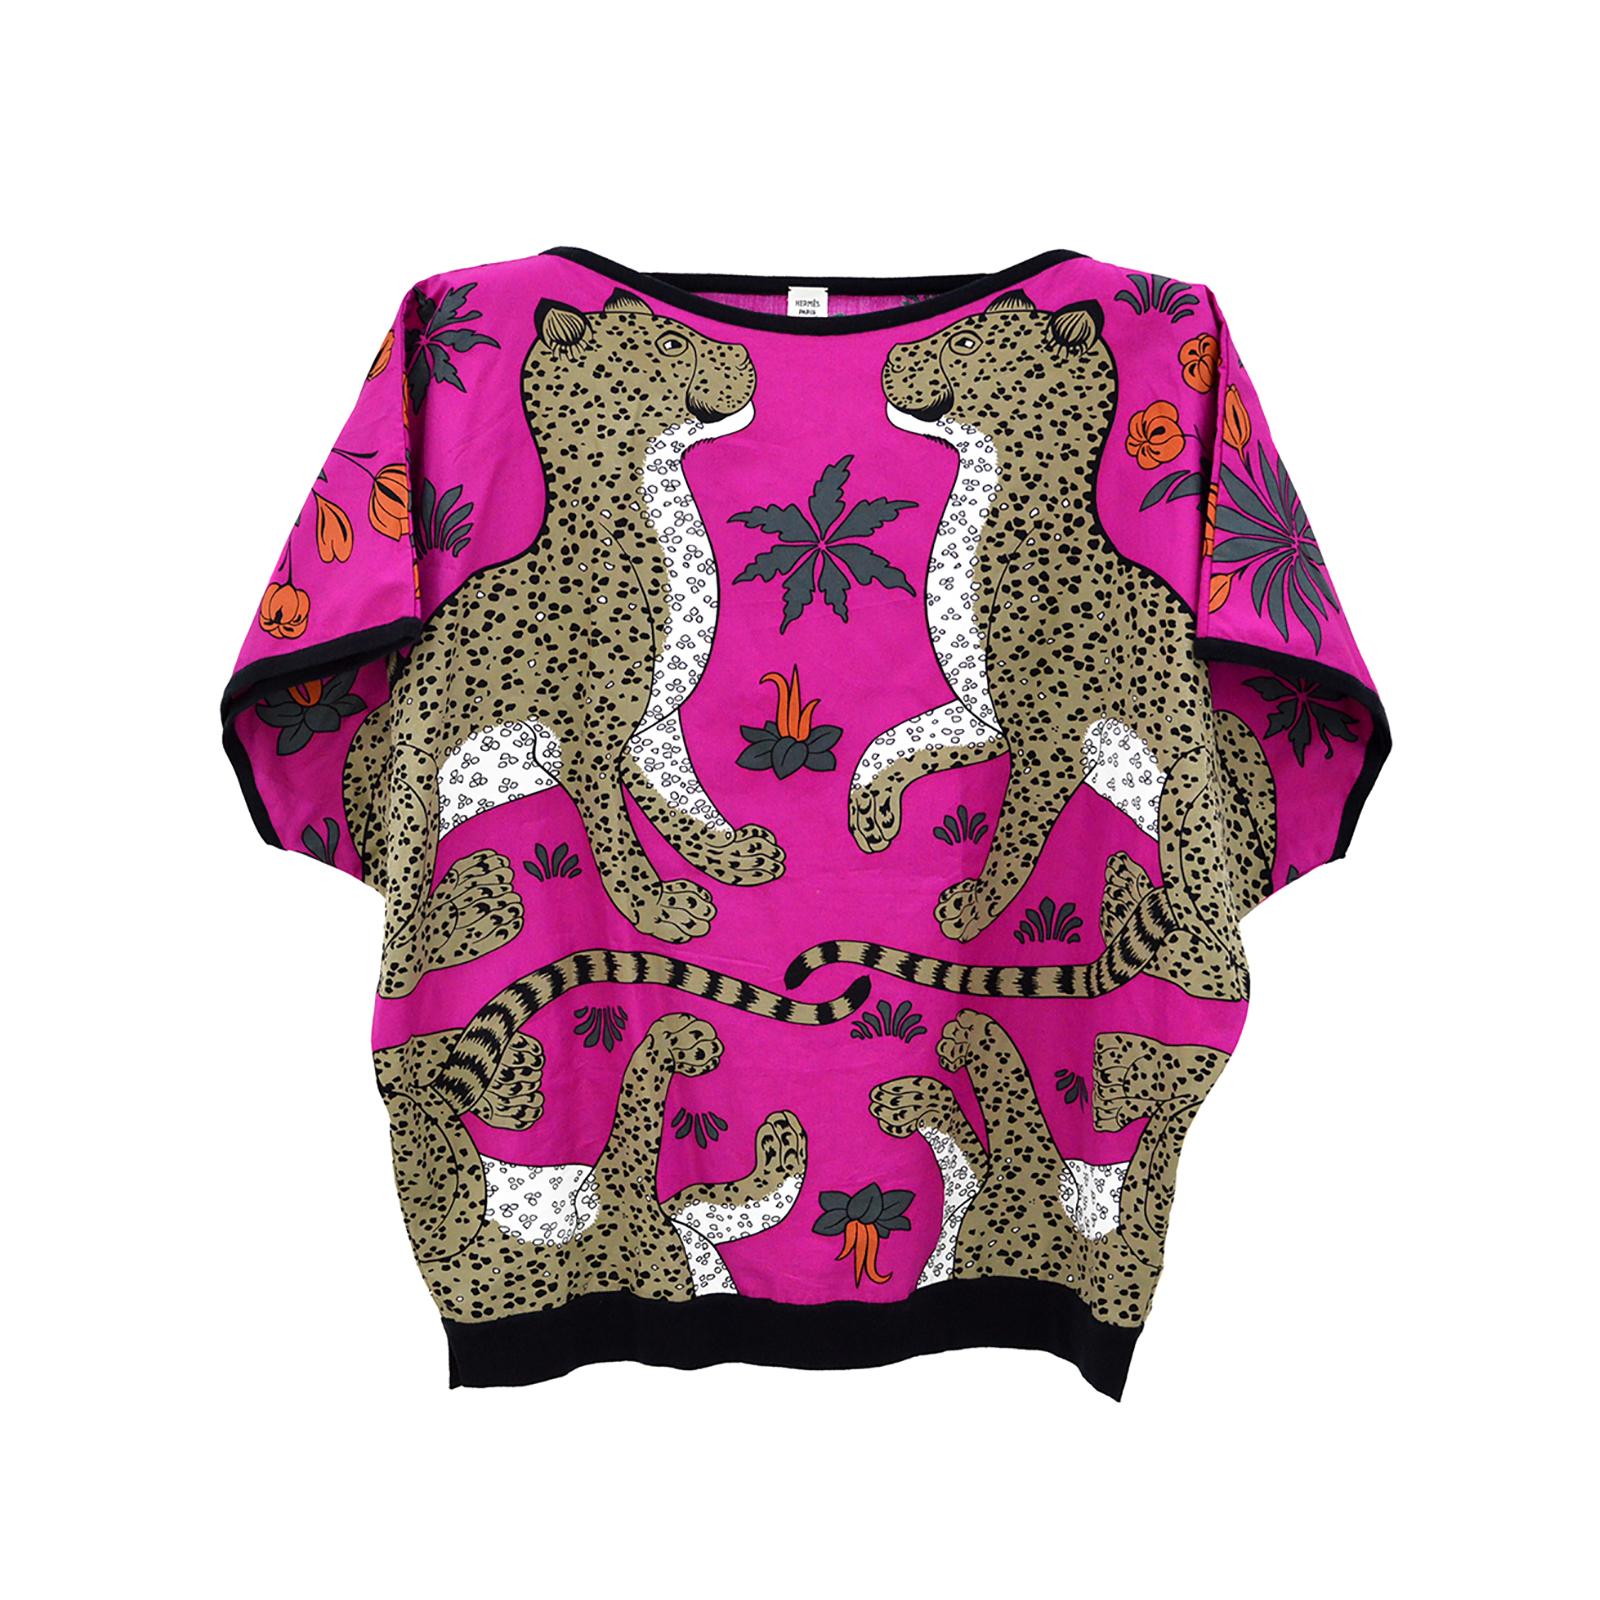 HERMES Les Leopards Fuchsia Pink Tunic Blouse Top HM190149